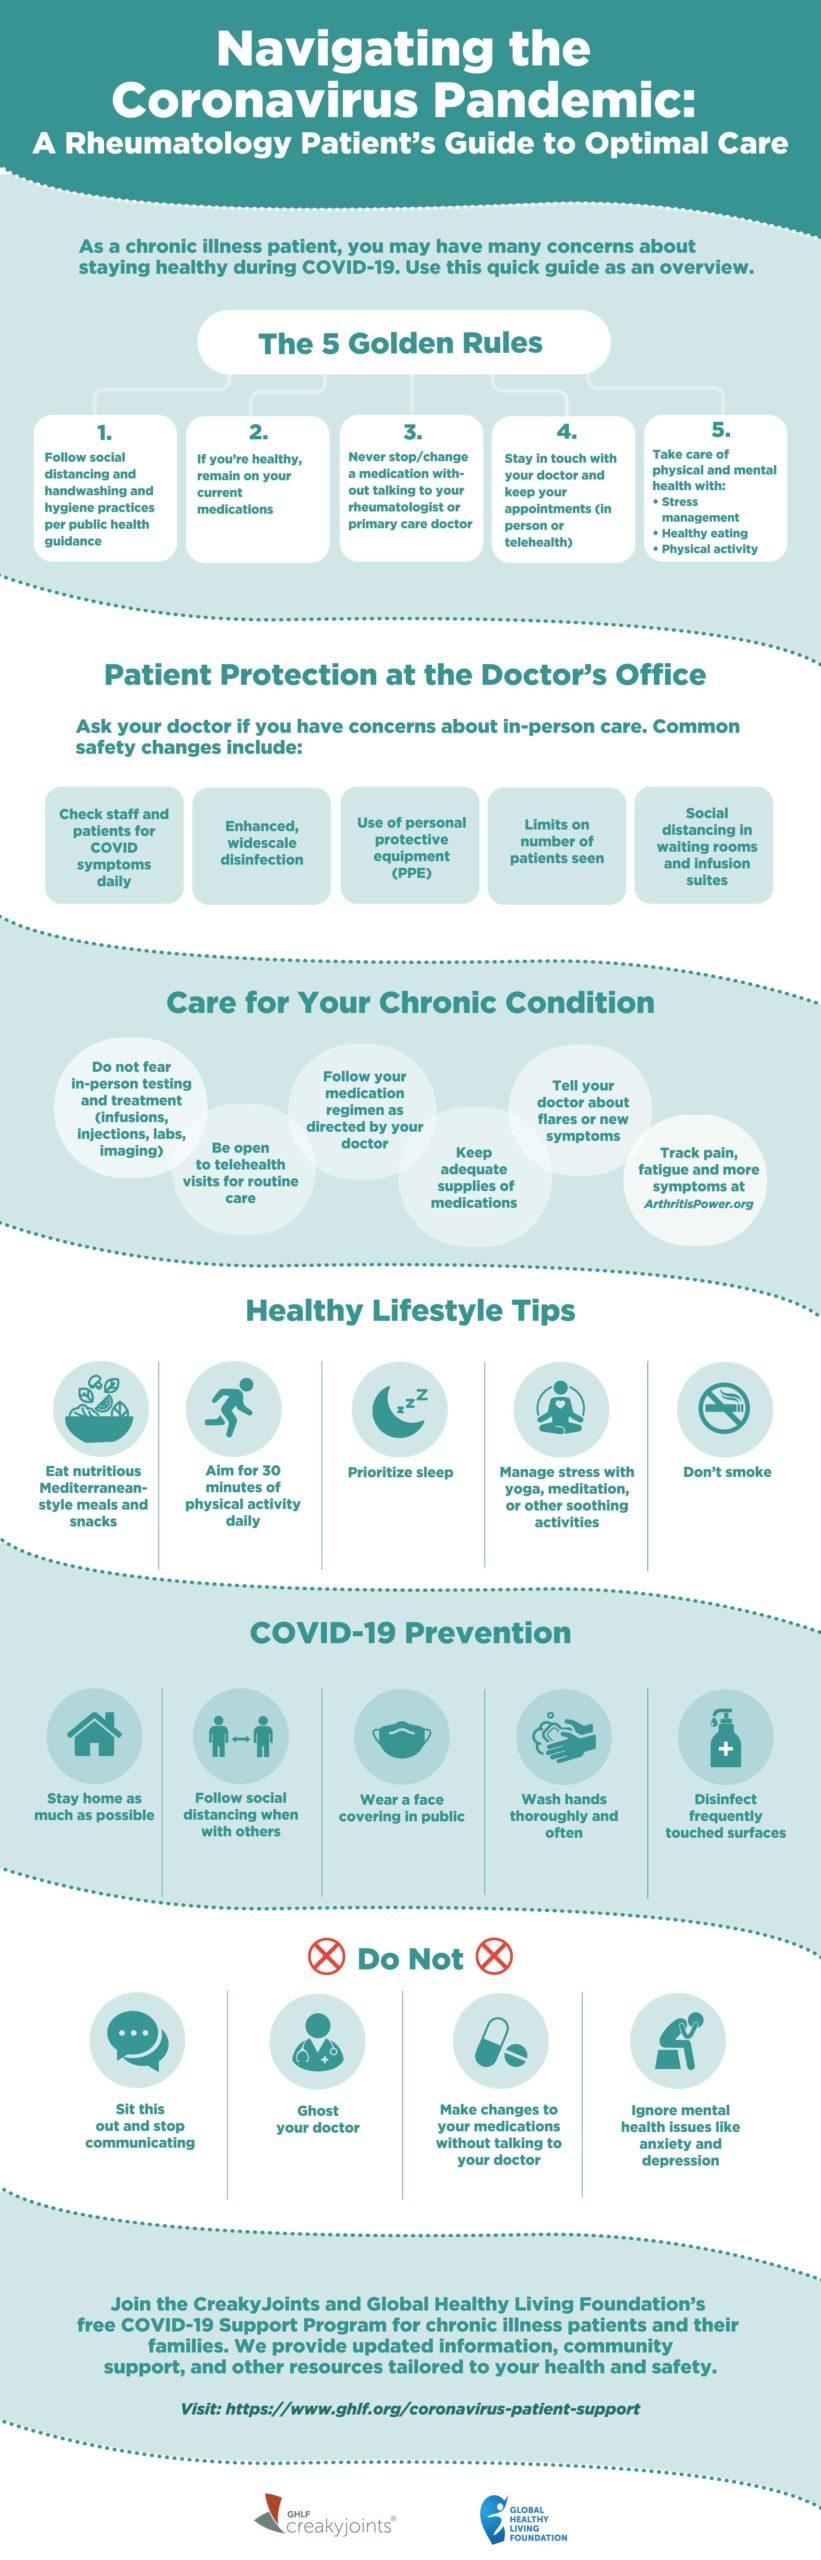 Coronavirus Pandemic Infographic for Arthritis Patients